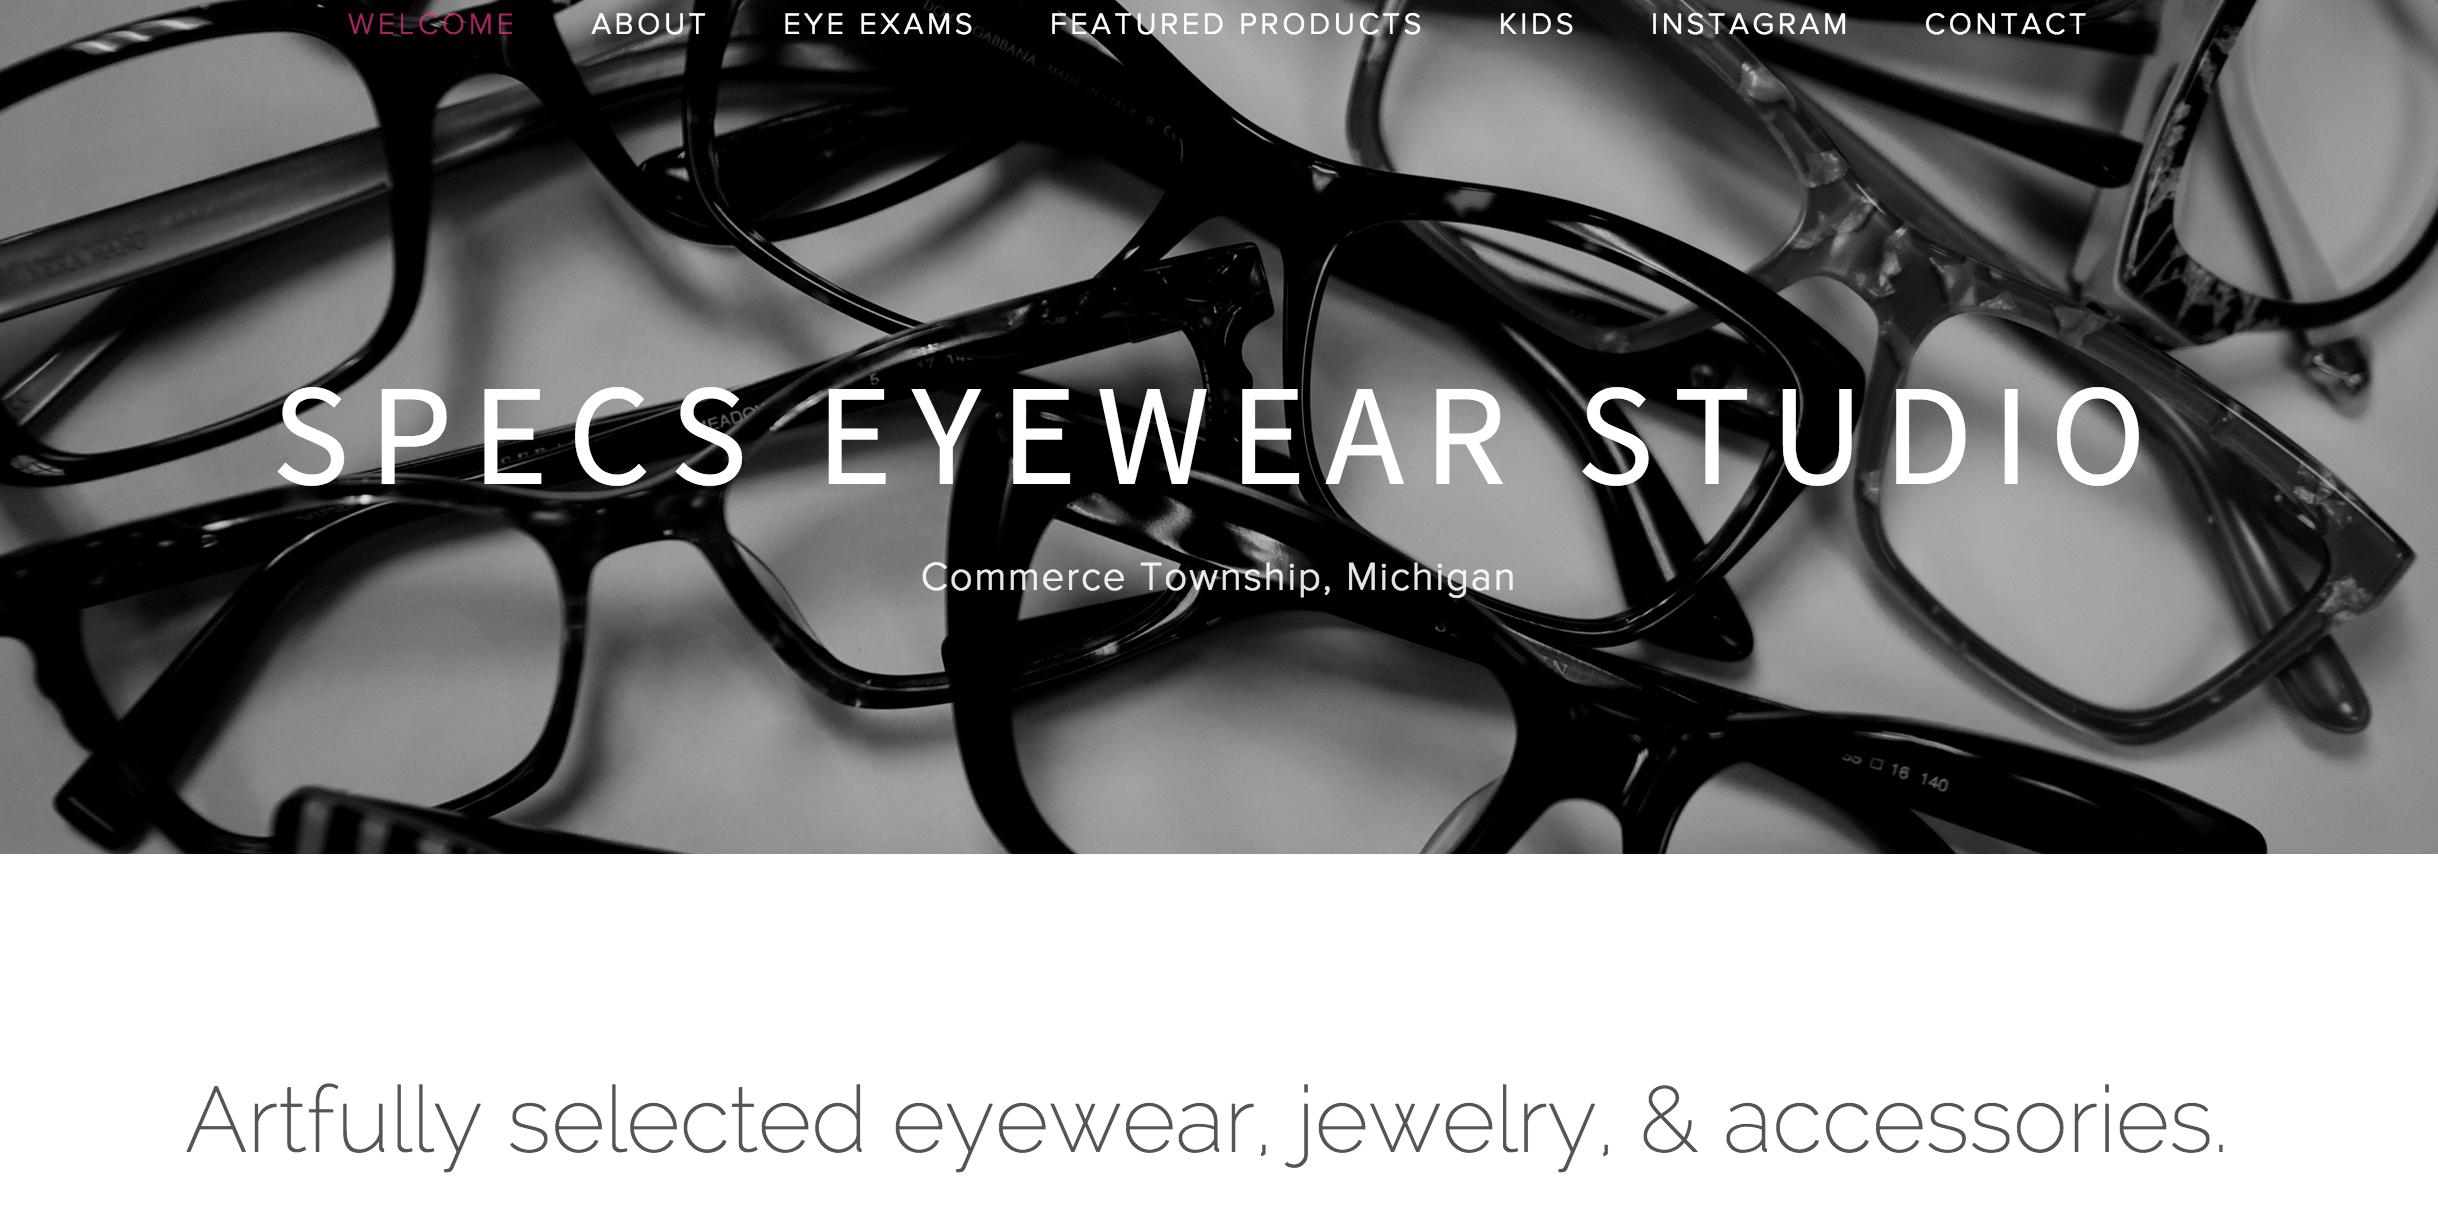 Specs website photo 1.jpg